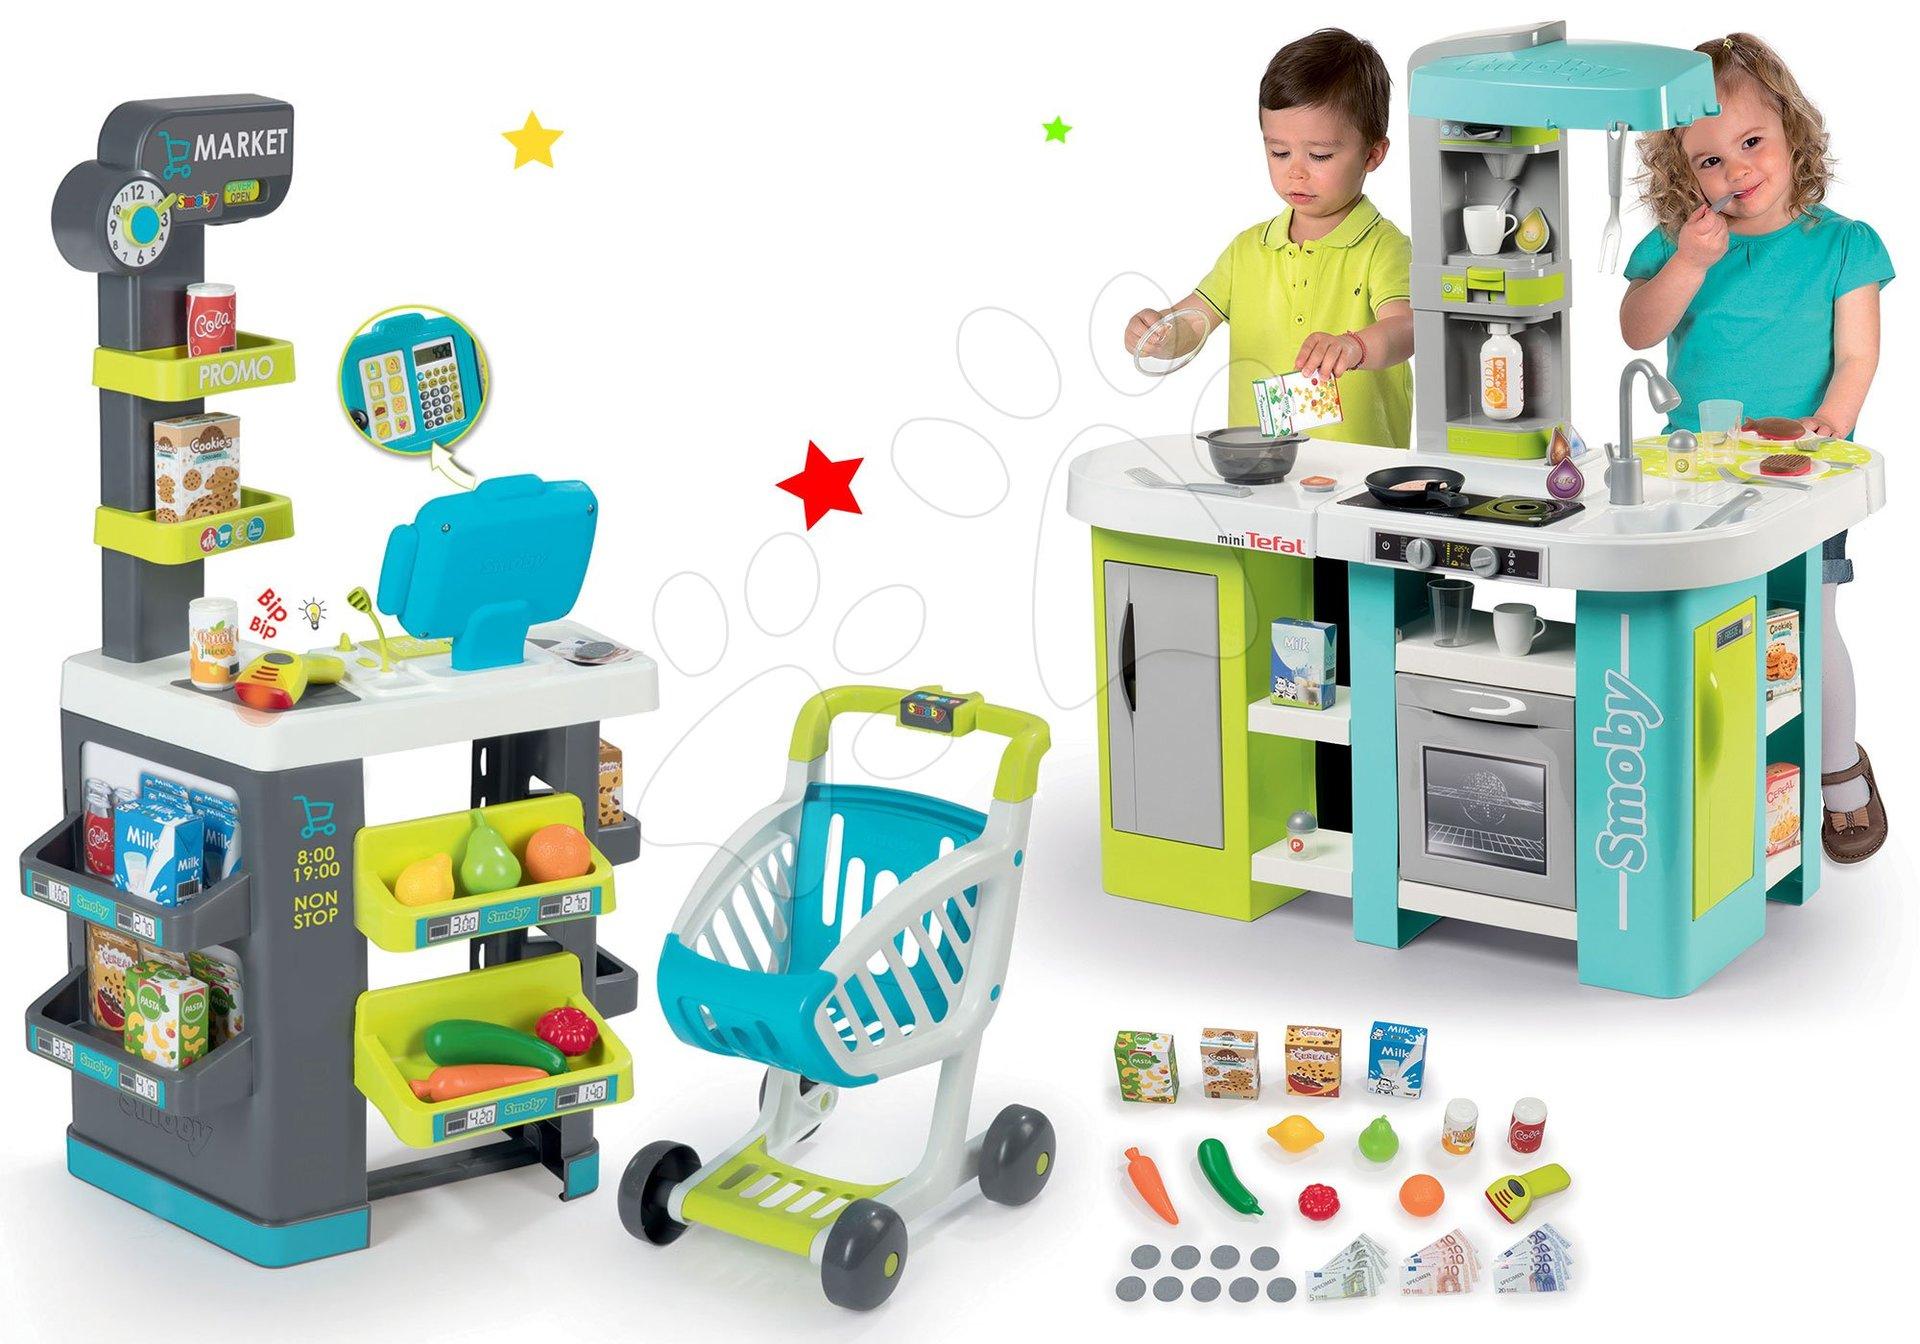 Smoby set obchod s potravinami Market a elektronická kuchynka Tefal Studio XL Bubble 350212-3